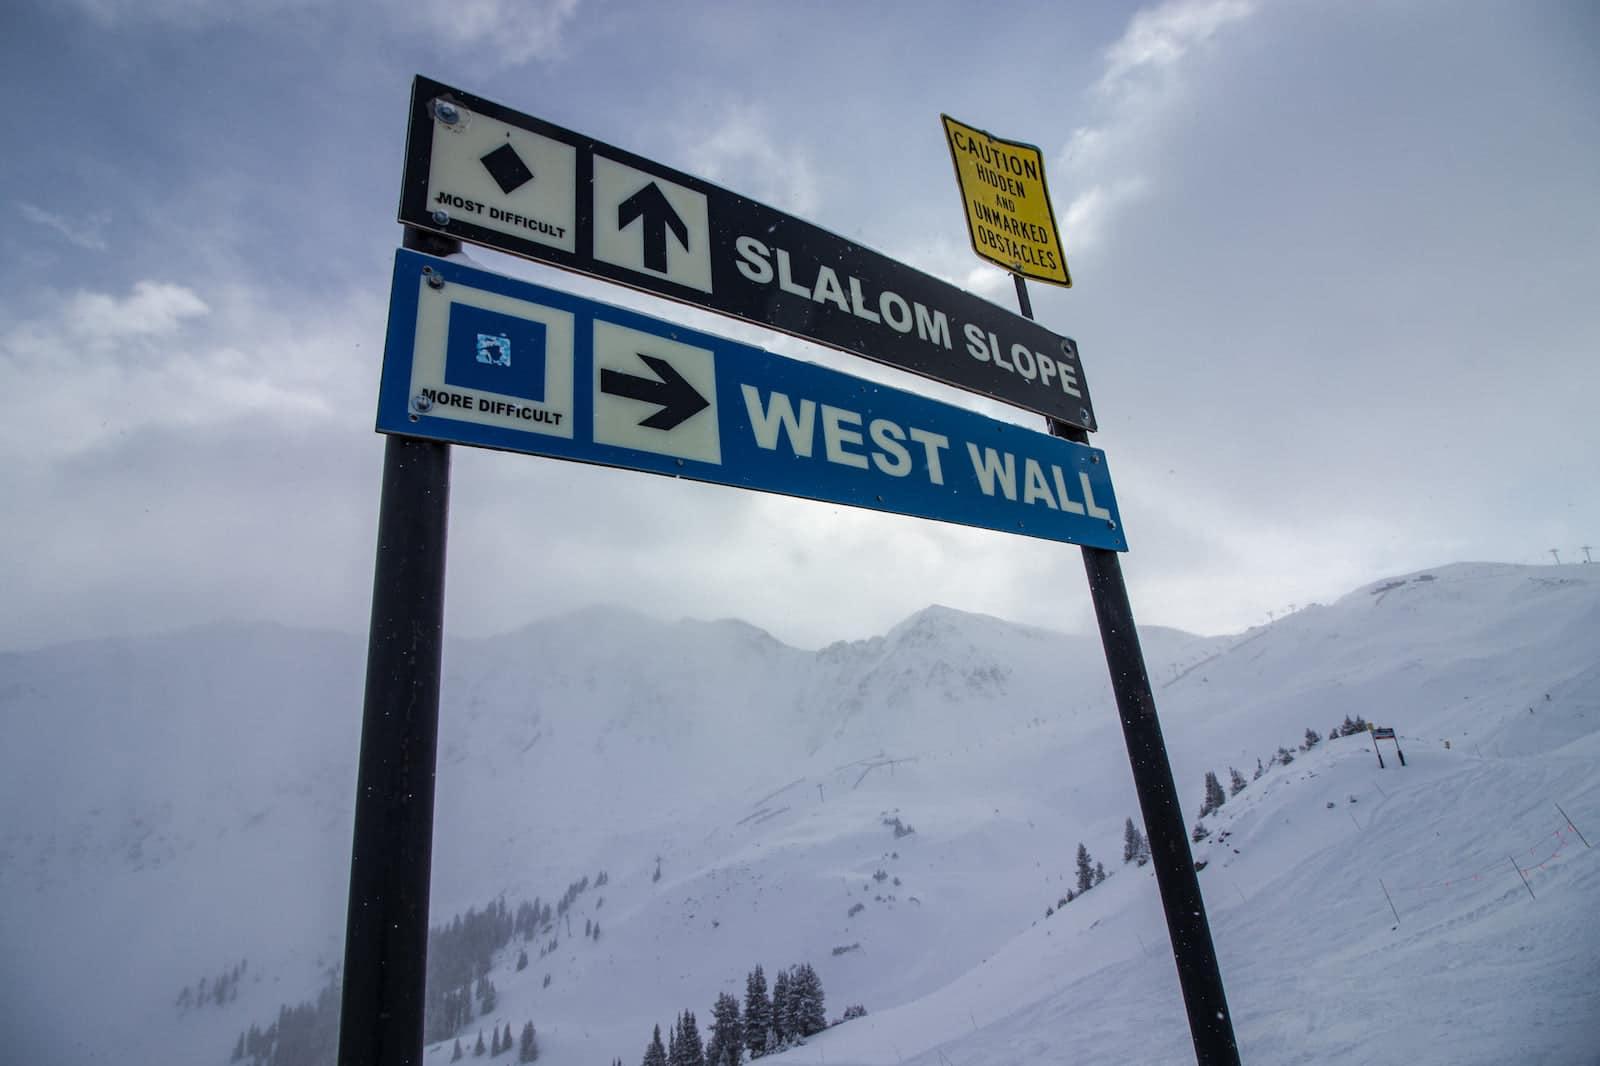 Image of signs at Arapaho Basin Ski Area in Colorado